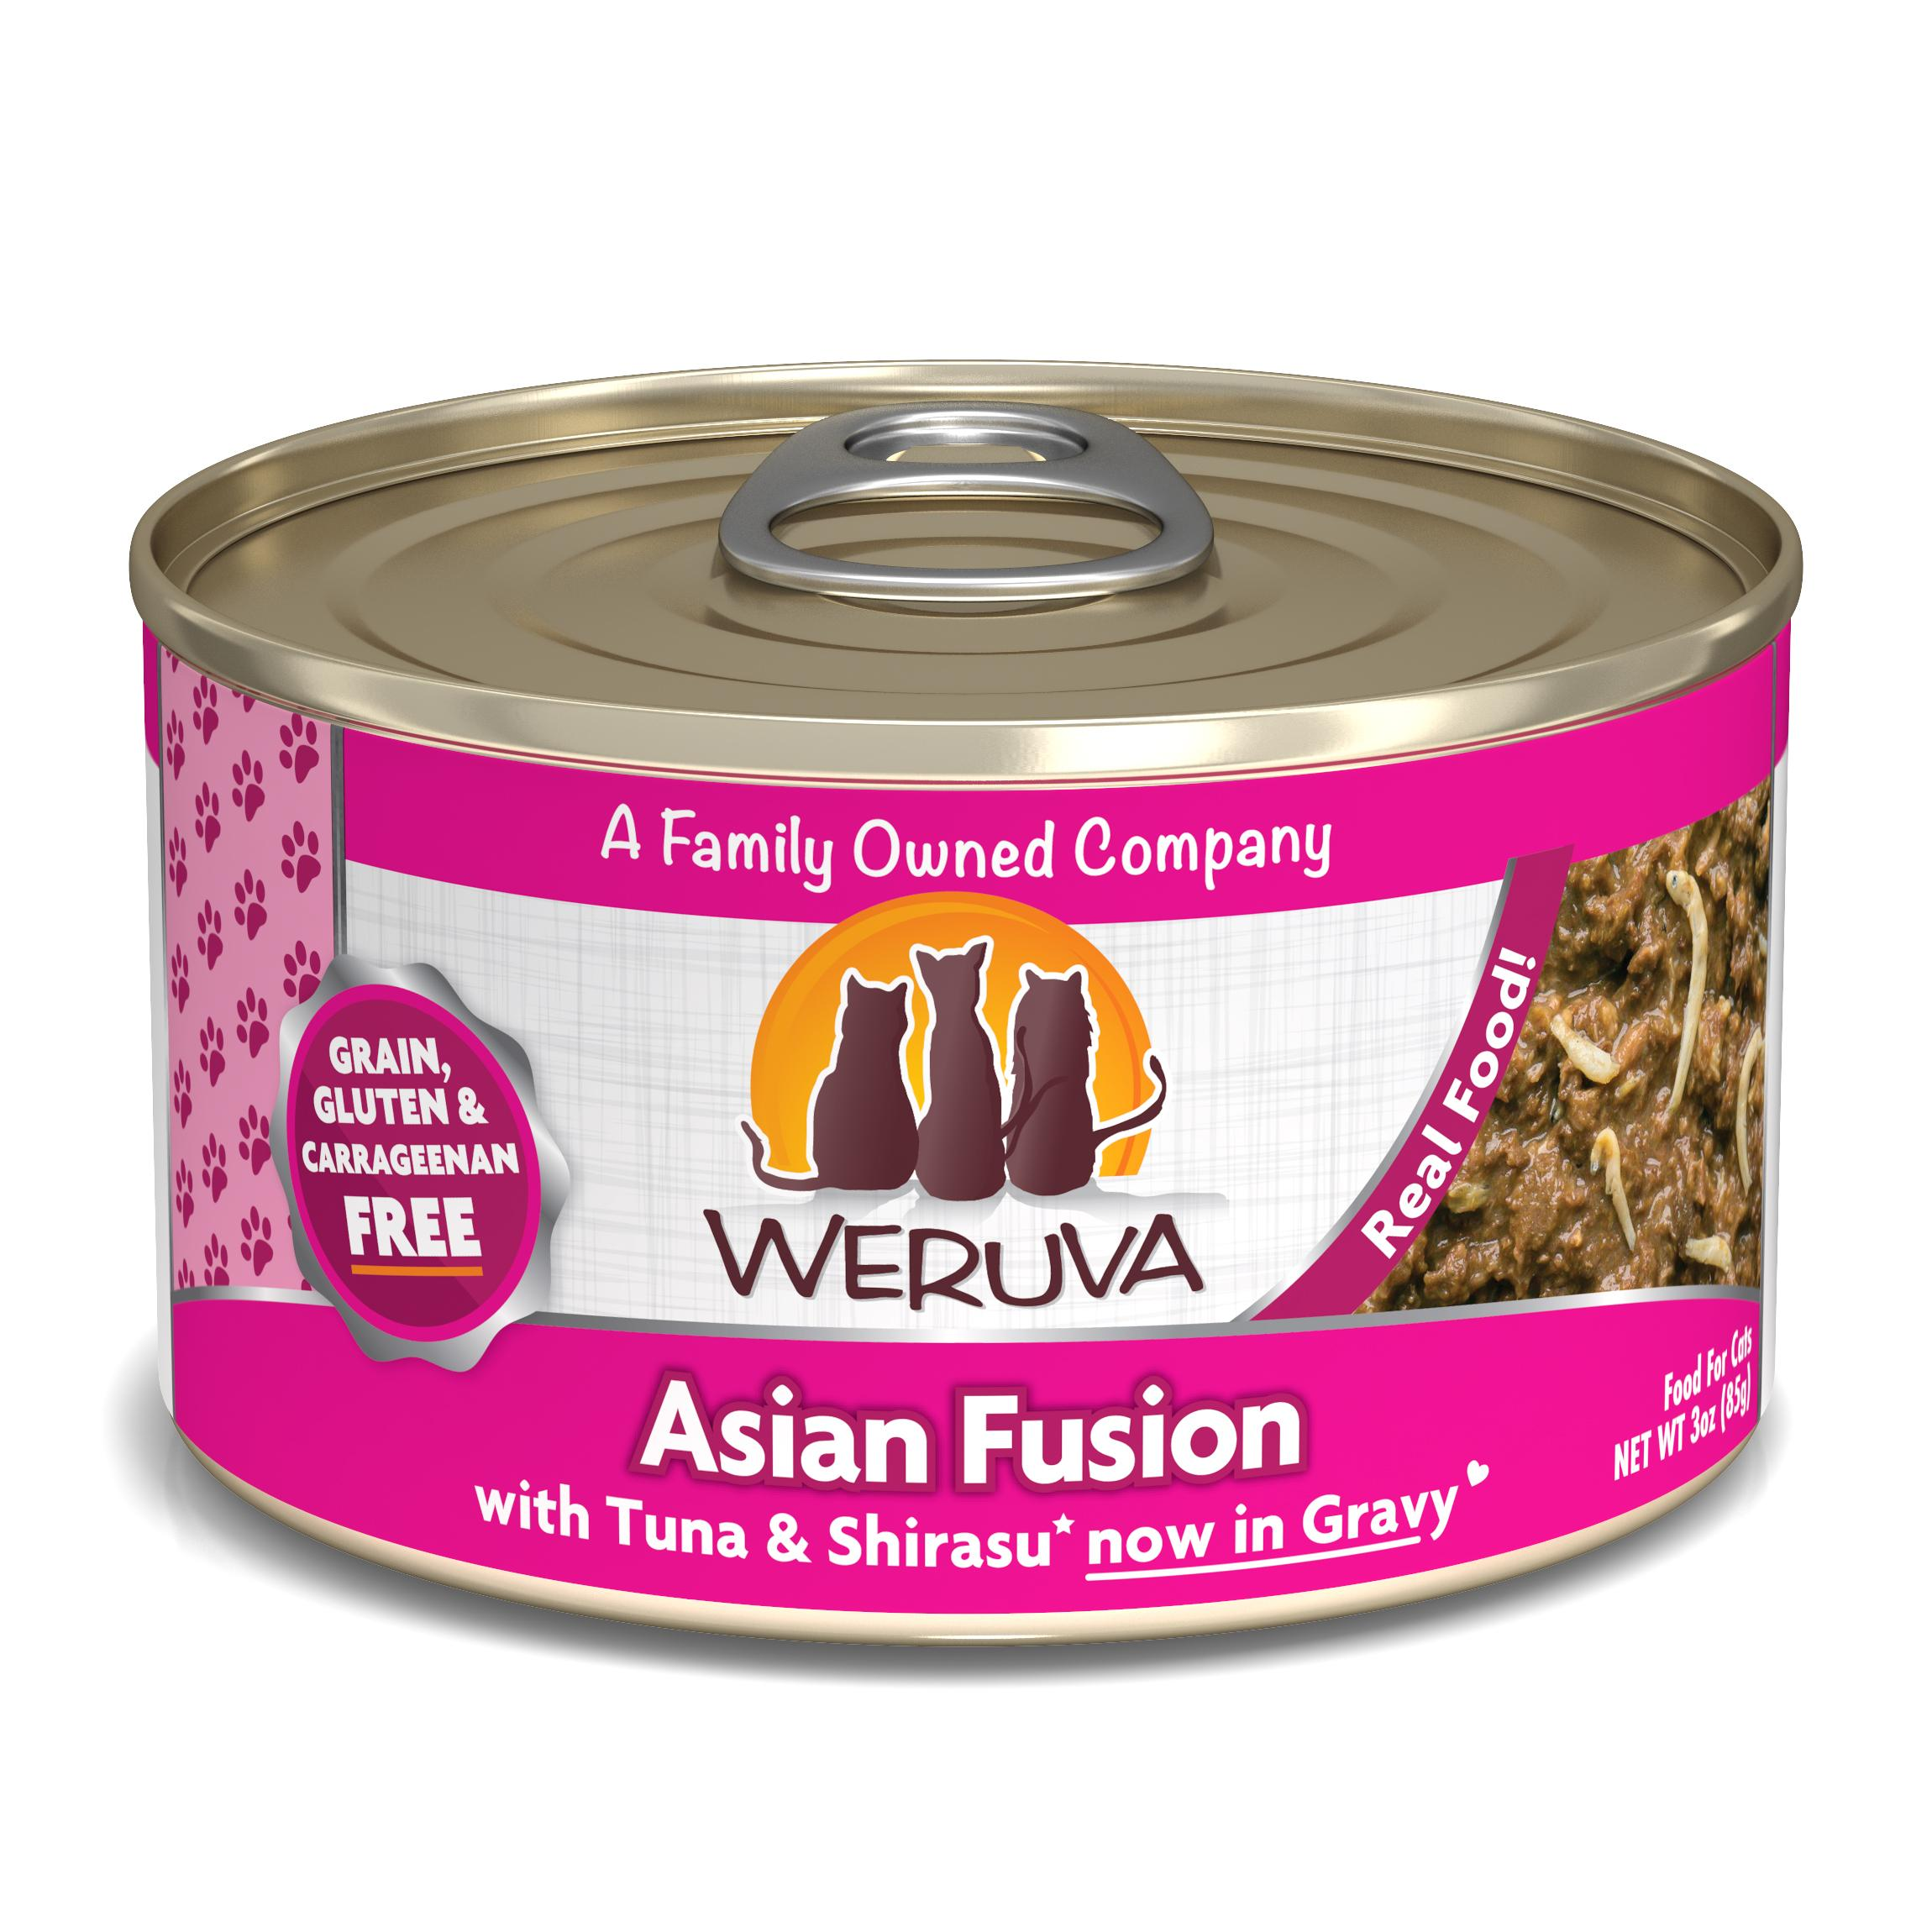 Weruva Cat Classic Asian Fusion with Tuna & Shirasu Grain-Free Wet Cat Food, 3-oz